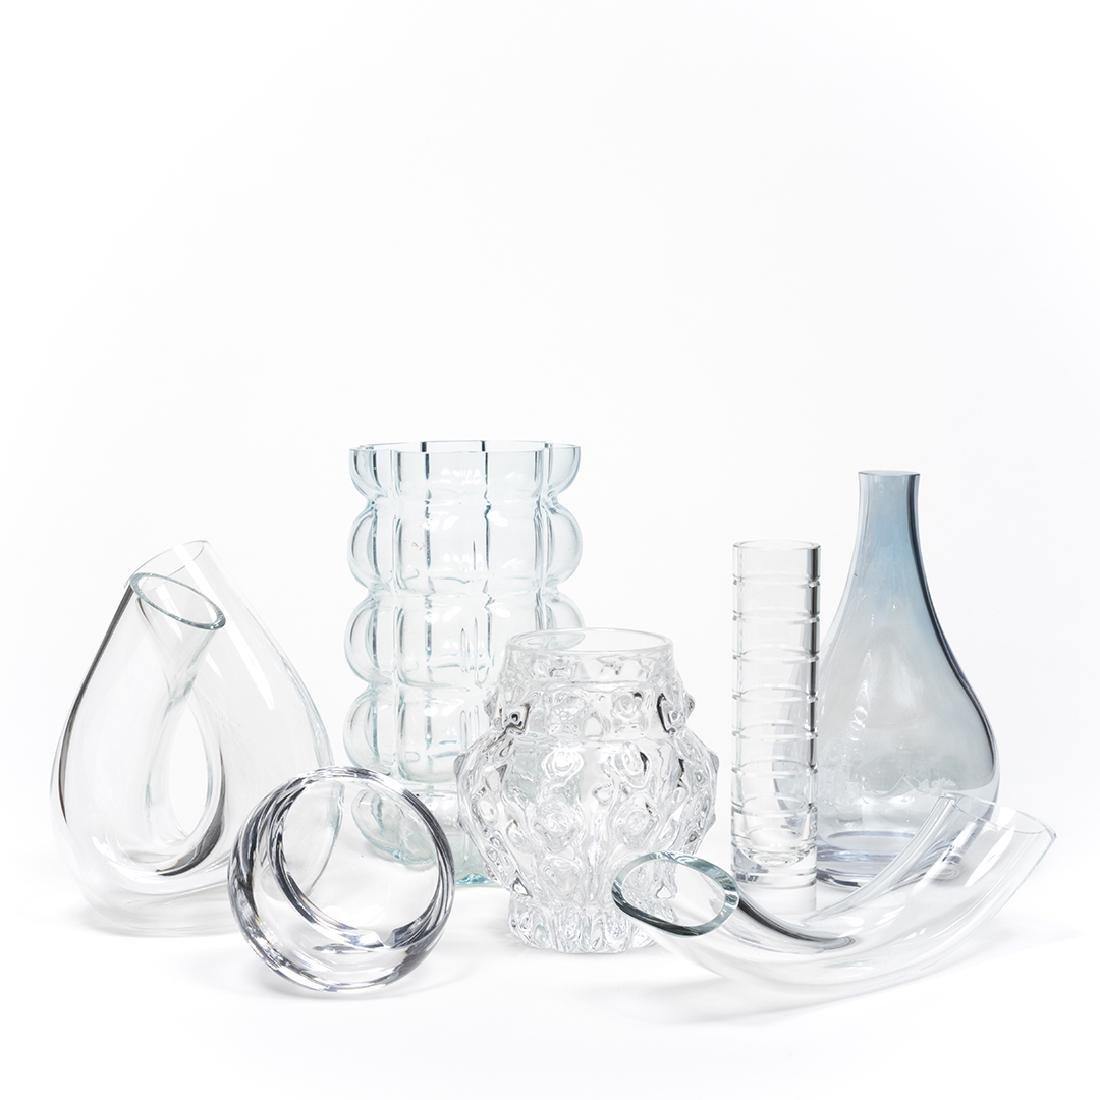 Modernist Clear Glass (8)